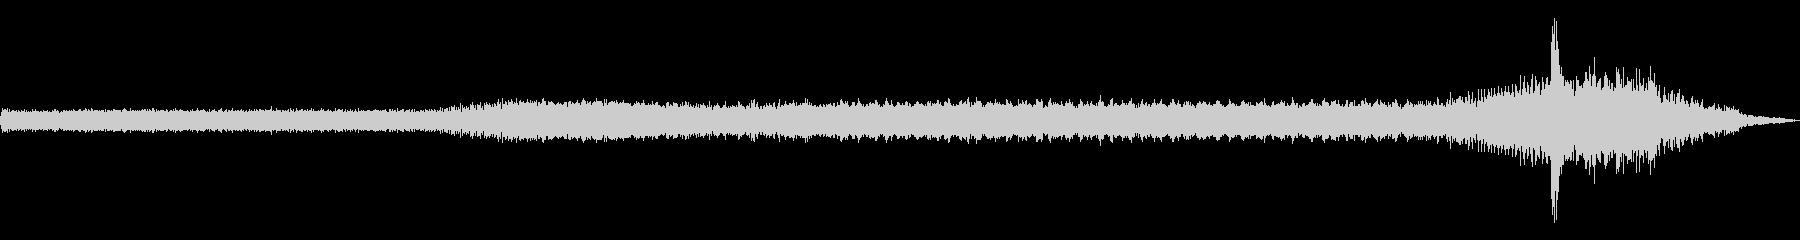 SPACEFIGHTER:VIND...の未再生の波形